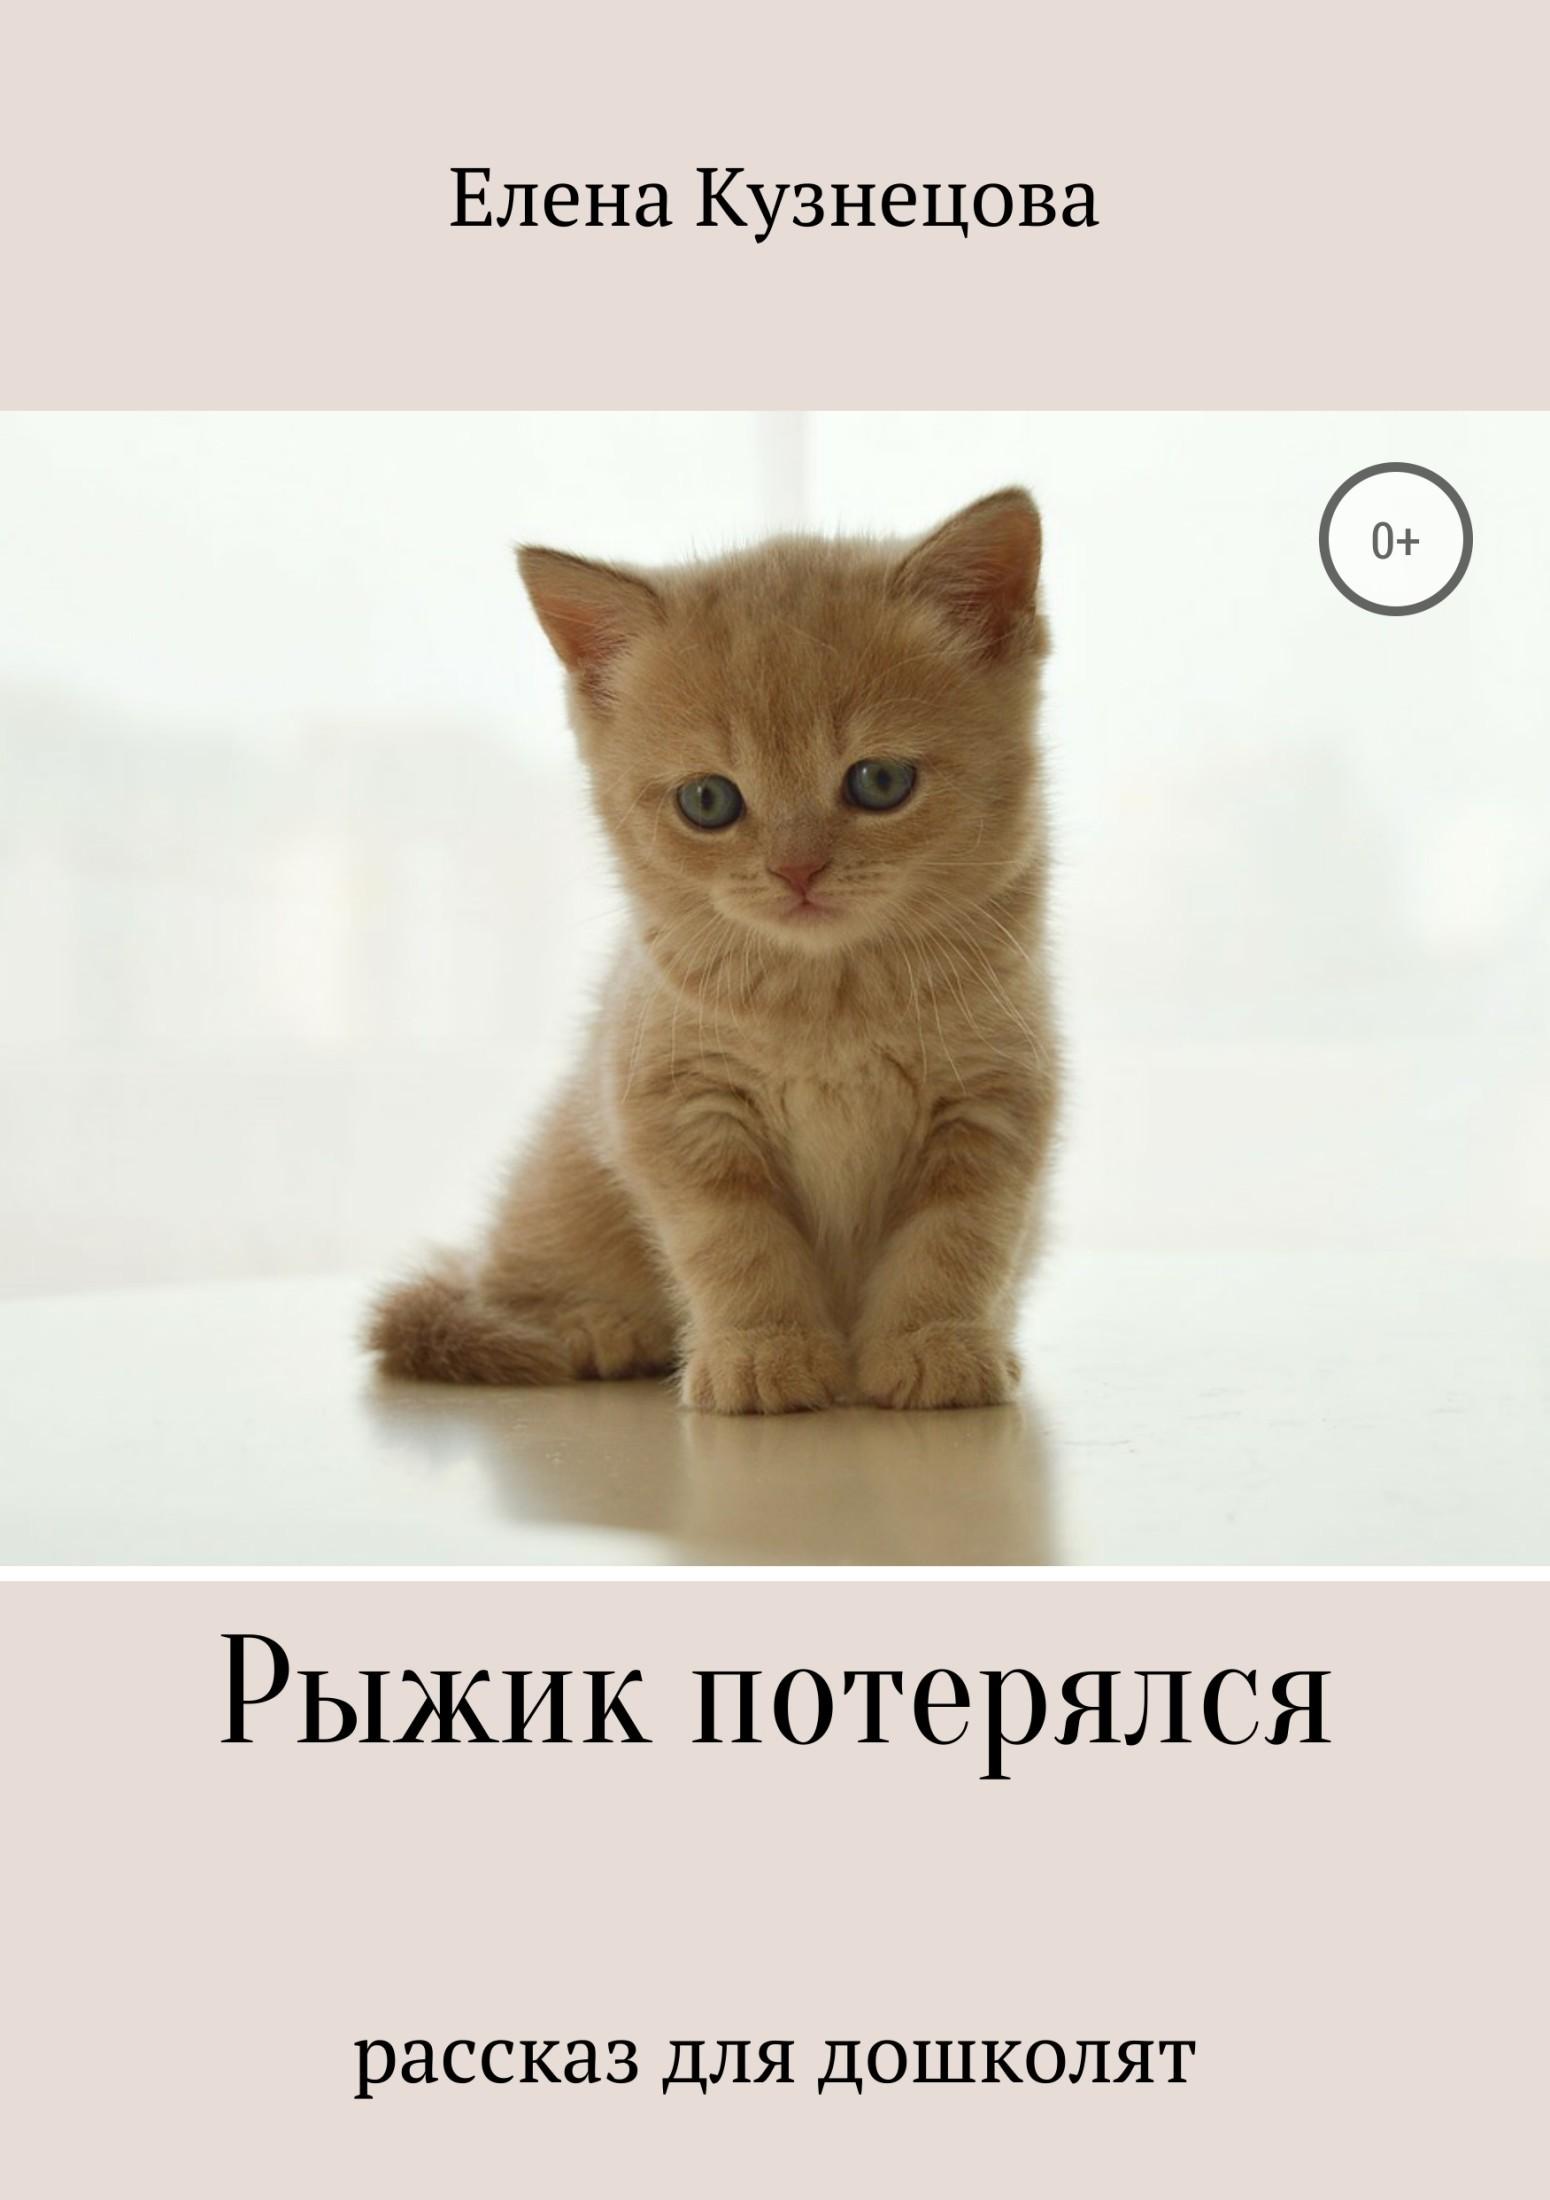 Елена Алексеевна Кузнецова Рыжик потерялся тарифный план